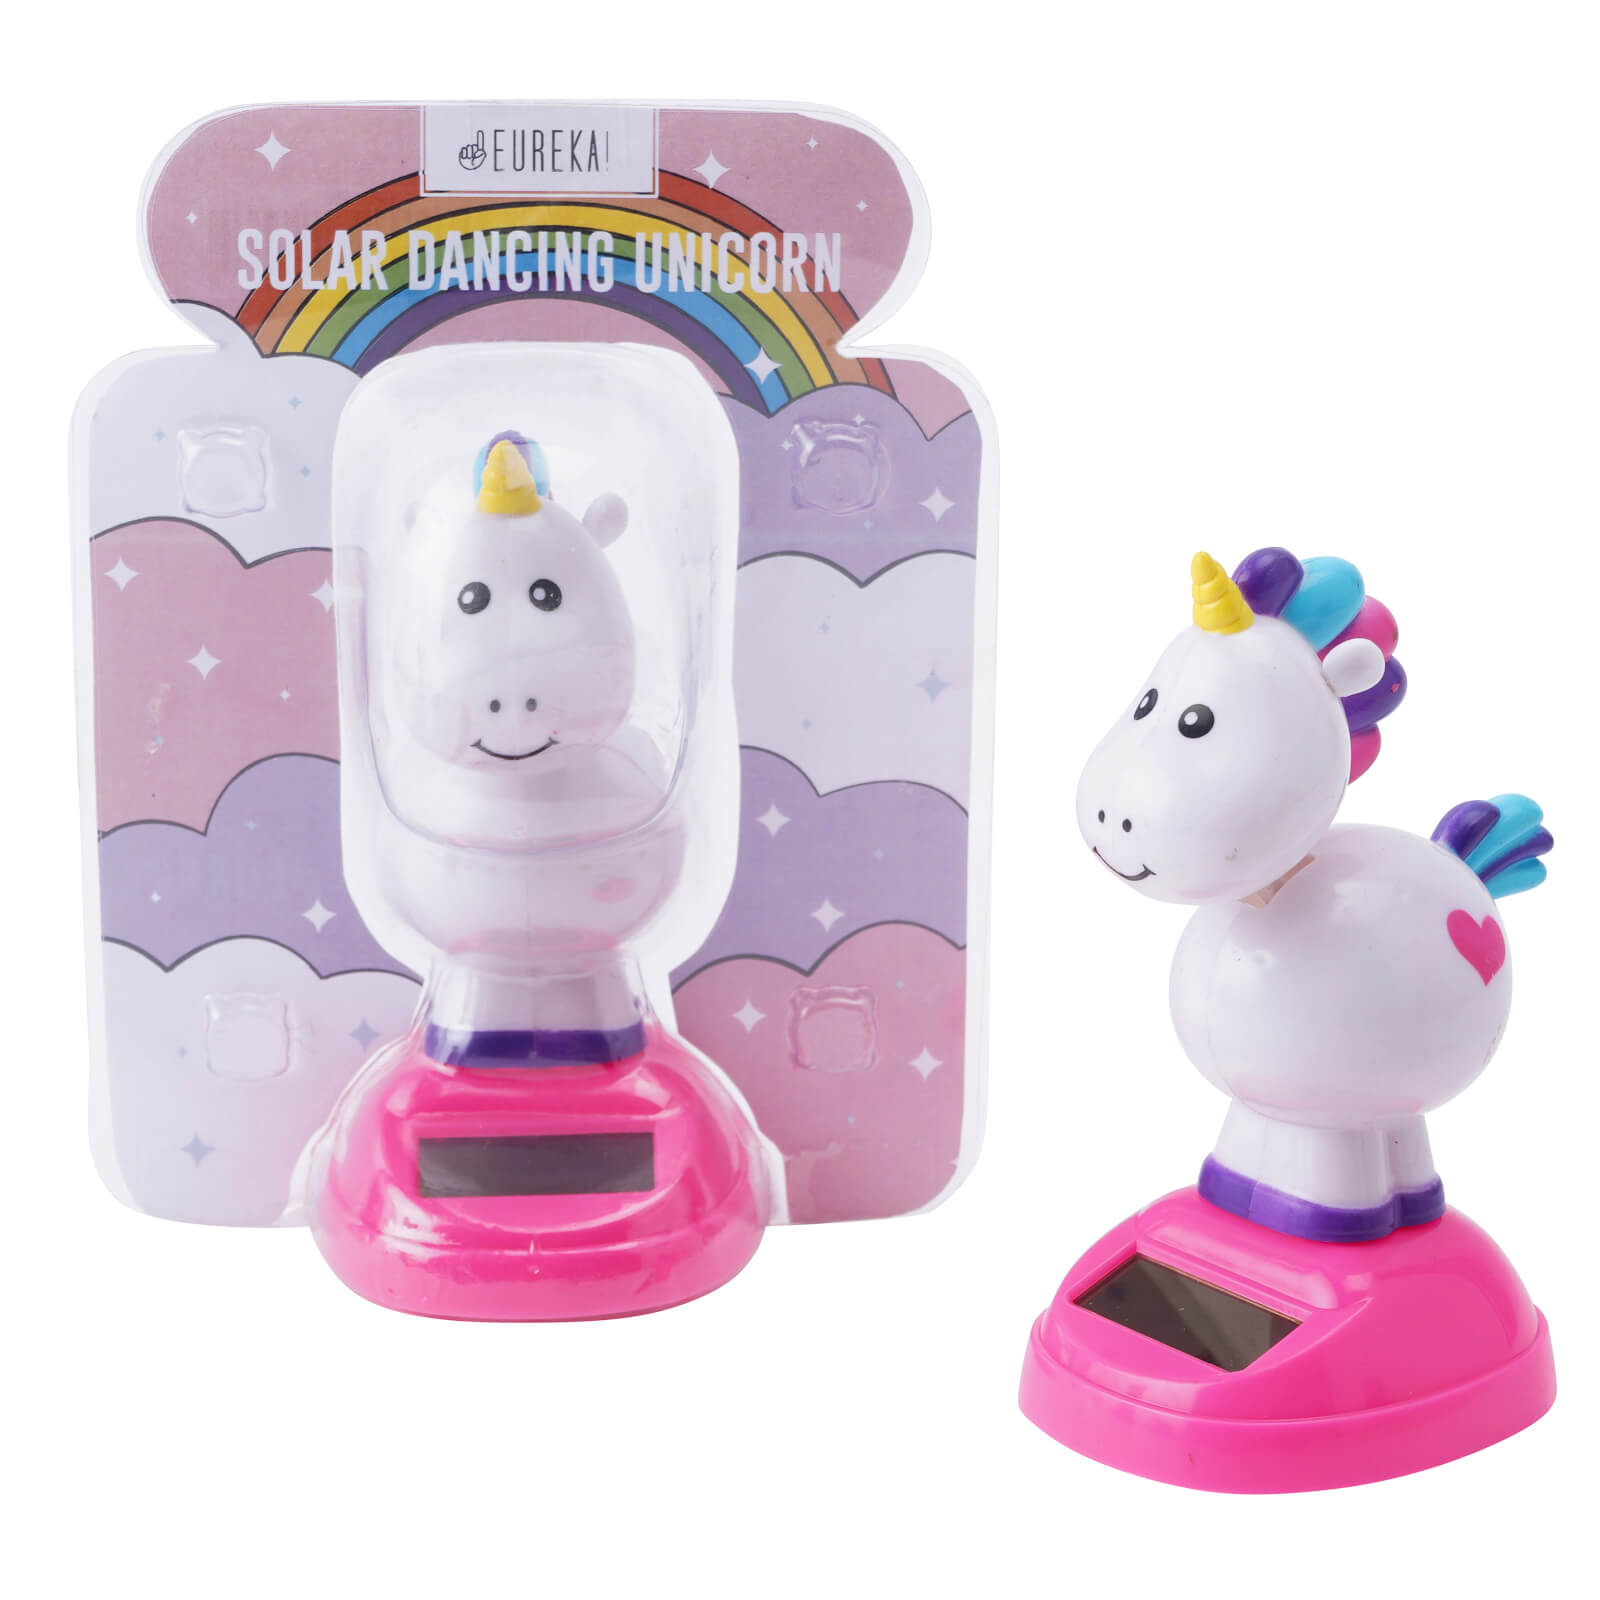 Image of Solar Dancing Desktop Unicorn